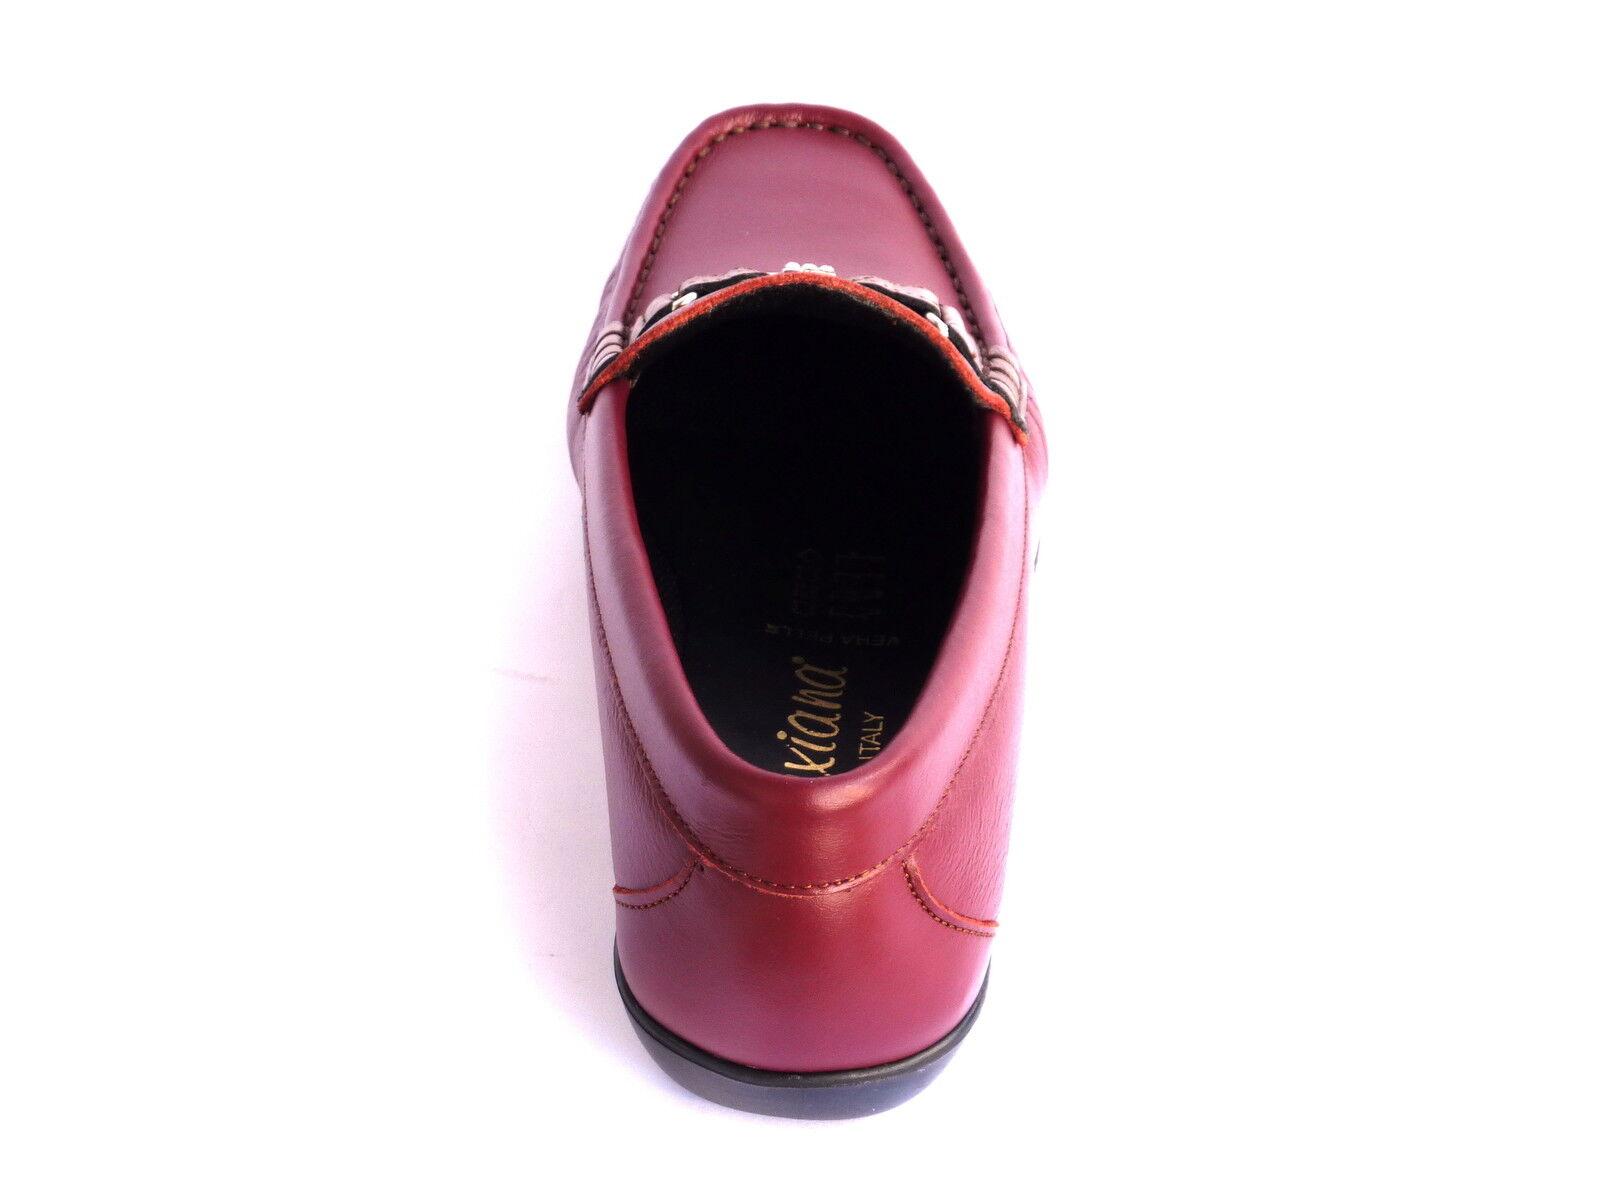 MOCASSINI Schuhe Damens SNEAKERS COMODA MODA COMODA SNEAKERS IN PELLE BORDO' MORBIDISSIME  n. 39 e35463